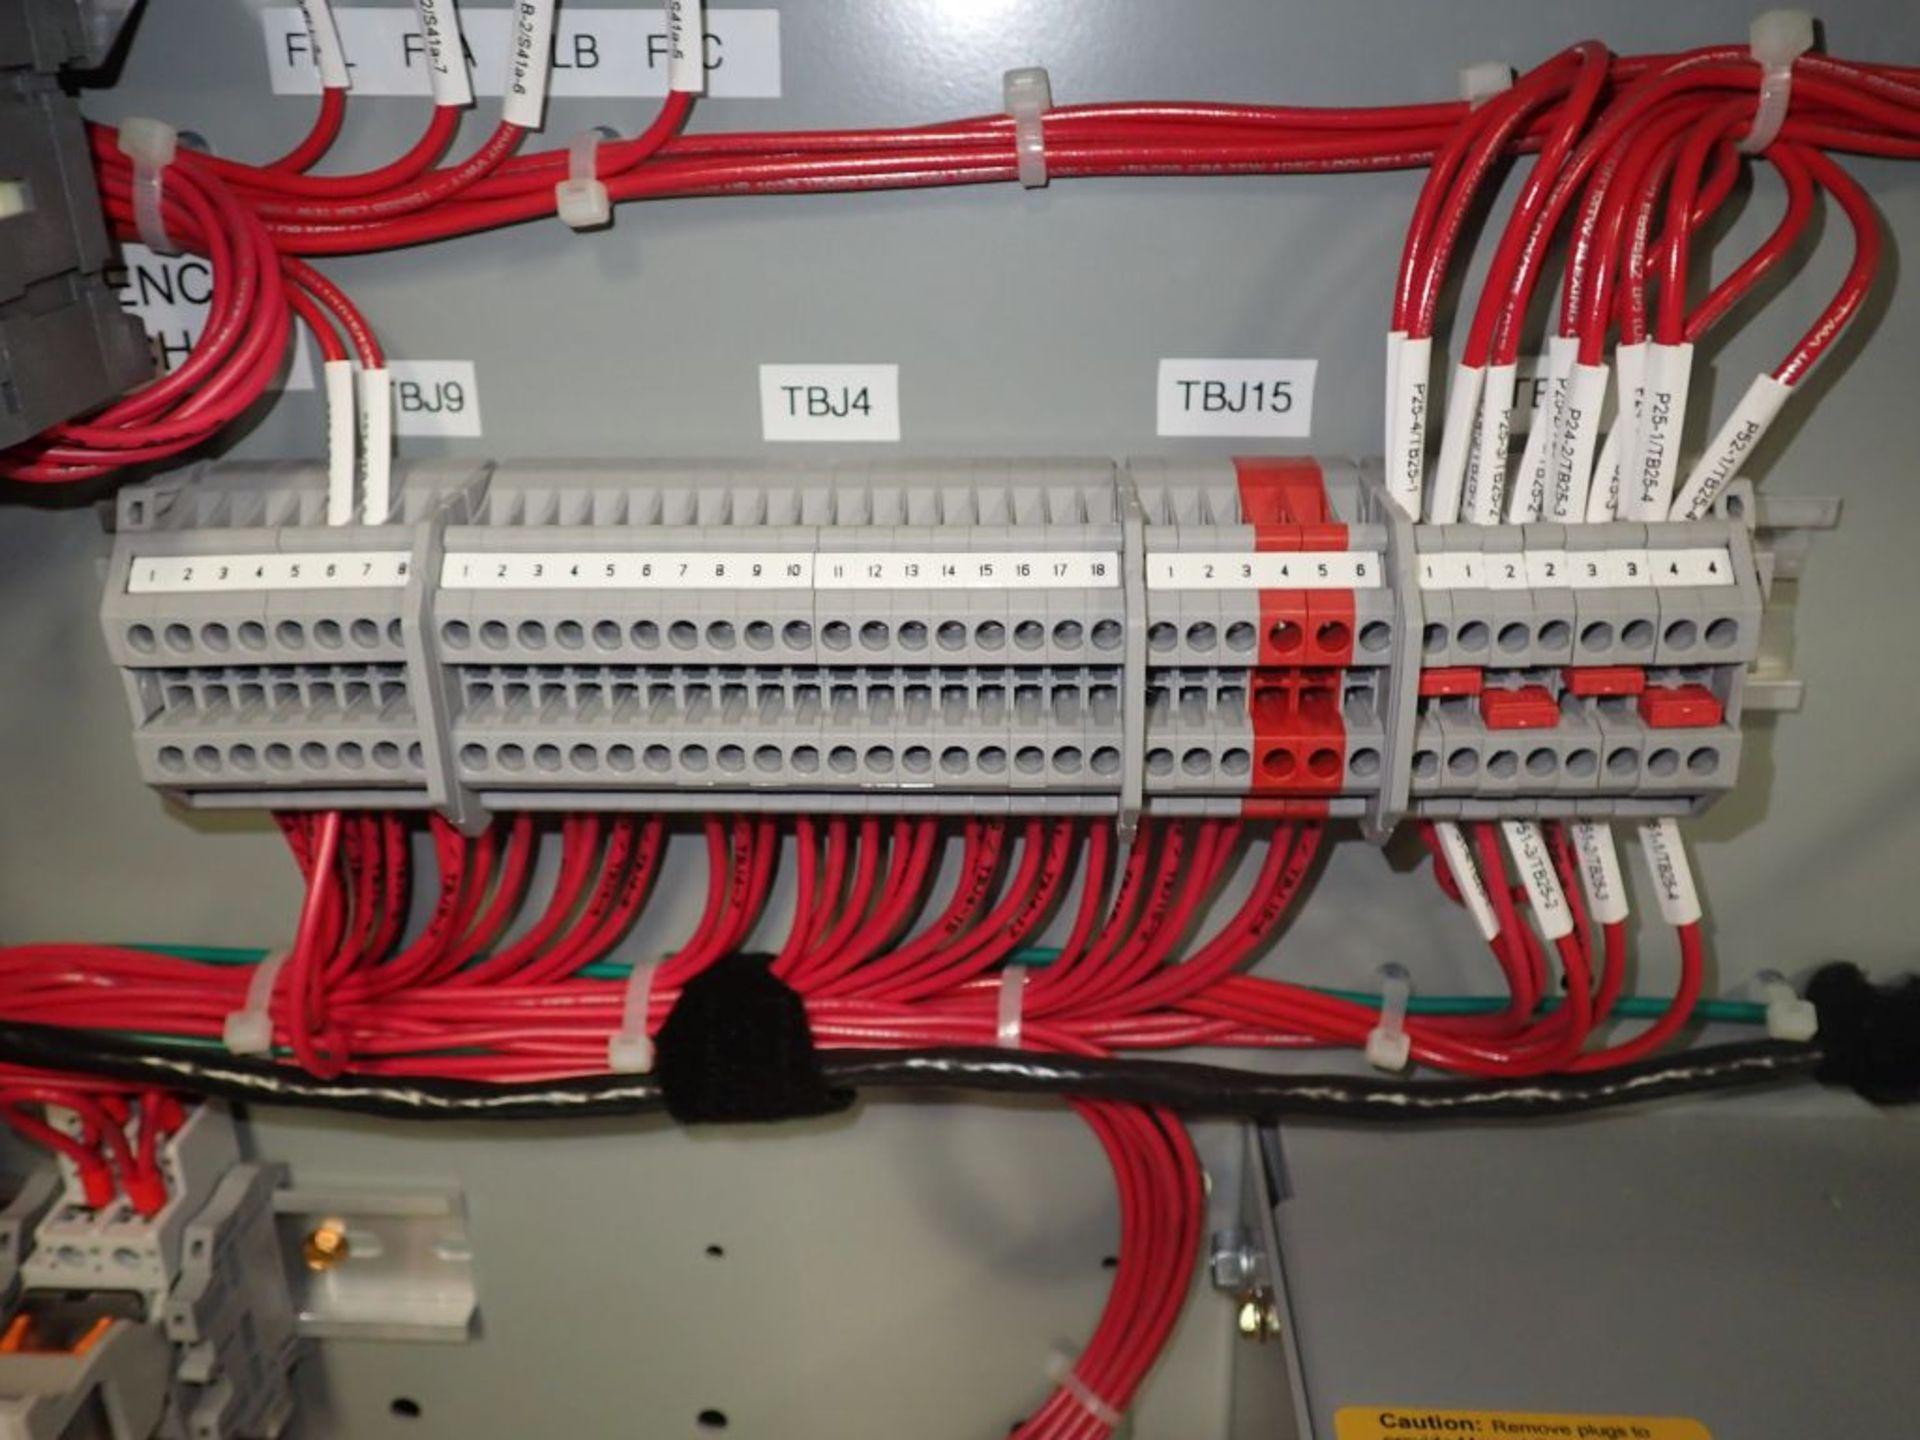 Eaton Transfer Switch | Cat No. ATV9MGB32500XSU; 480V; 3 PH; 2500A; (2) Eaton Magnum DS Circuit - Image 23 of 50